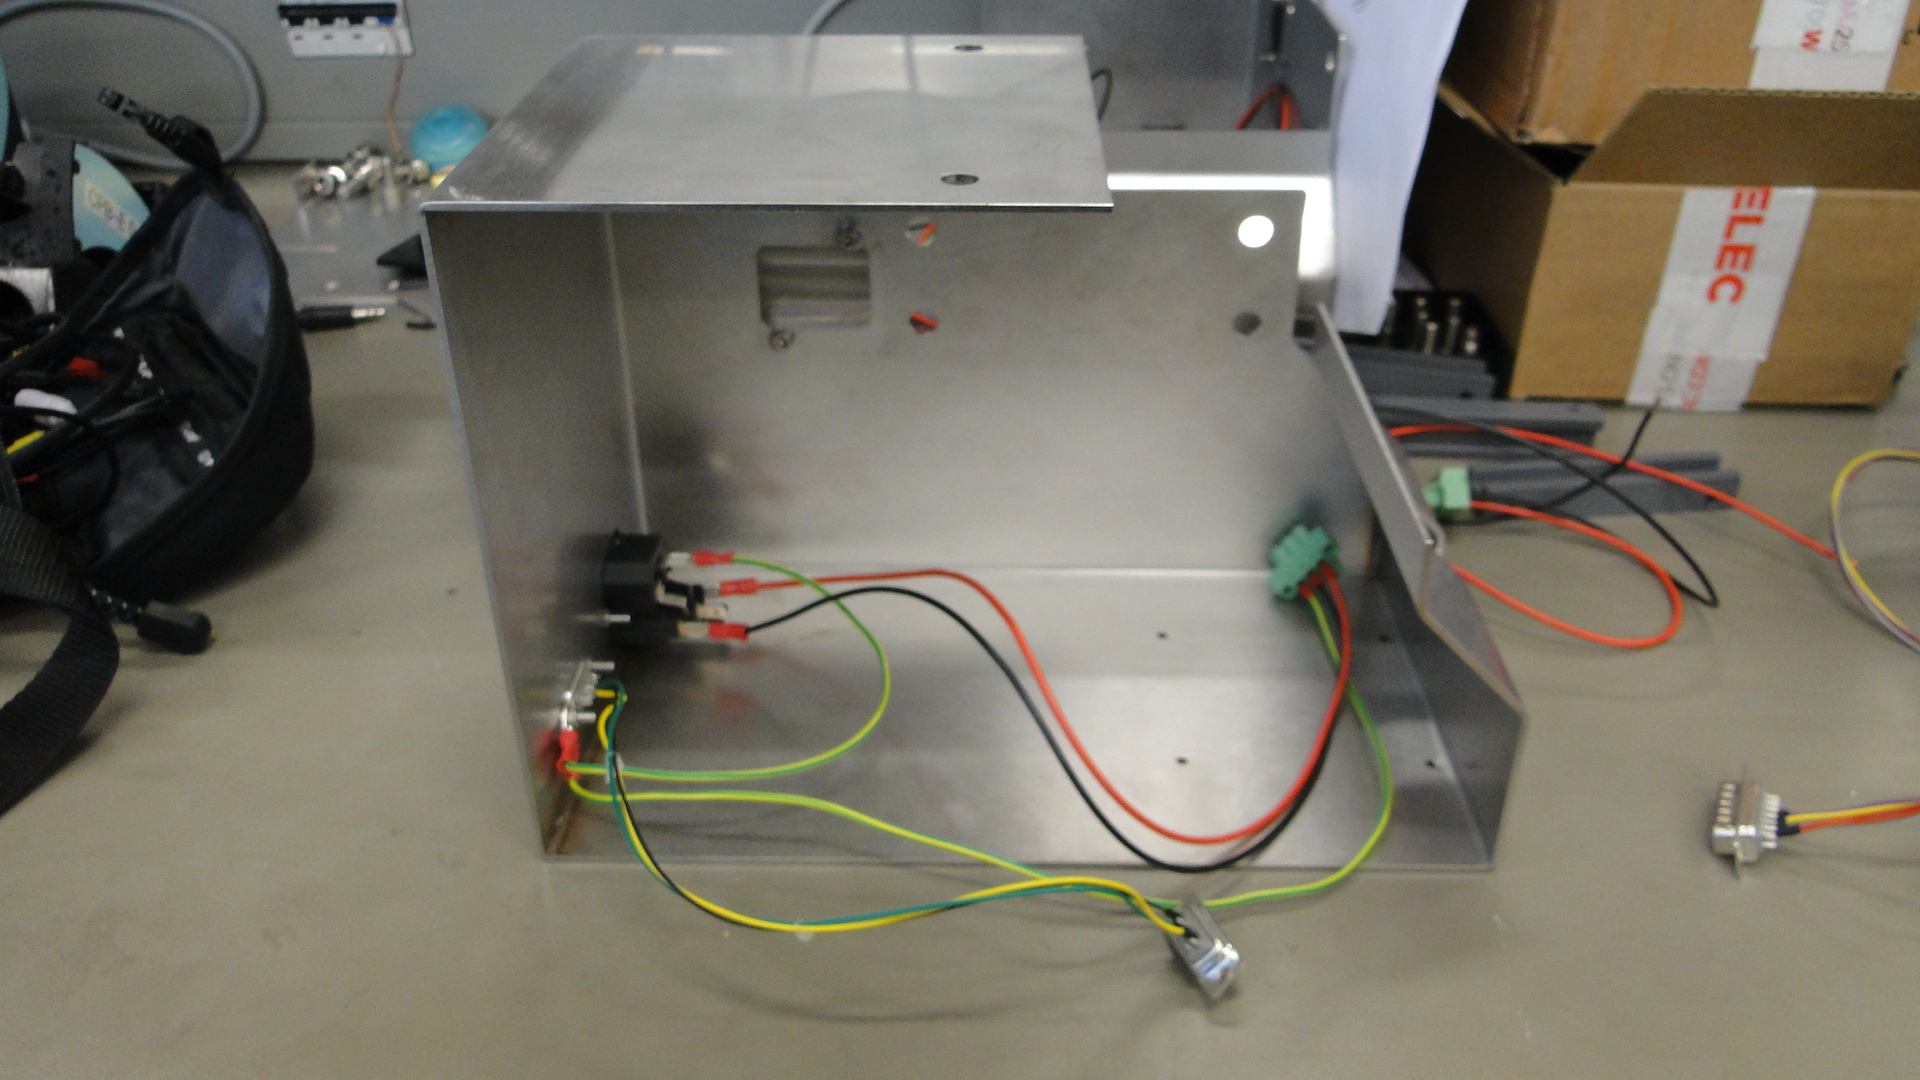 Projektarbeit Displaytestadapter – Ausbildung bei Endress+Hauser